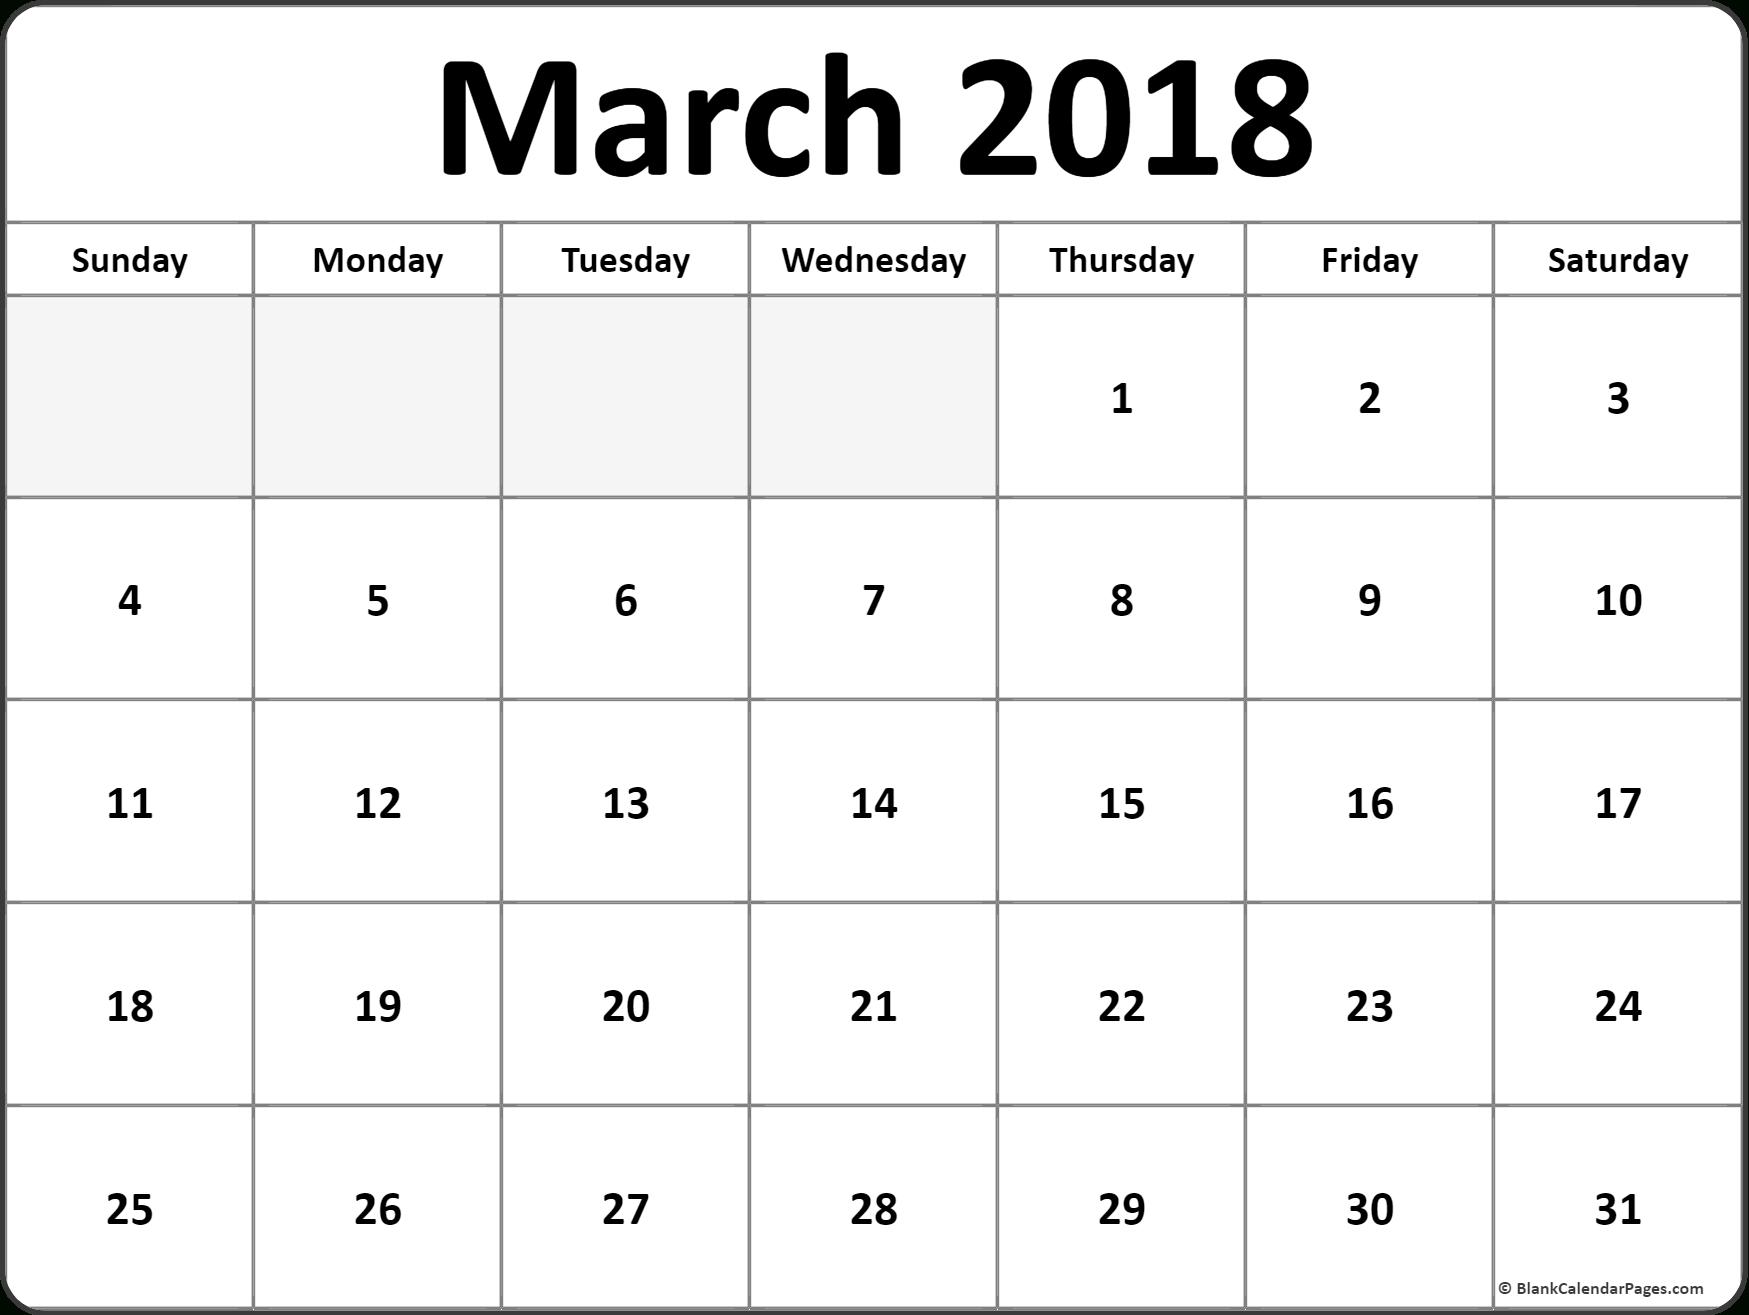 March 2018 Monthly Calendar Printout #March #Printable # Inside 52 Week Printable Calendar Blank